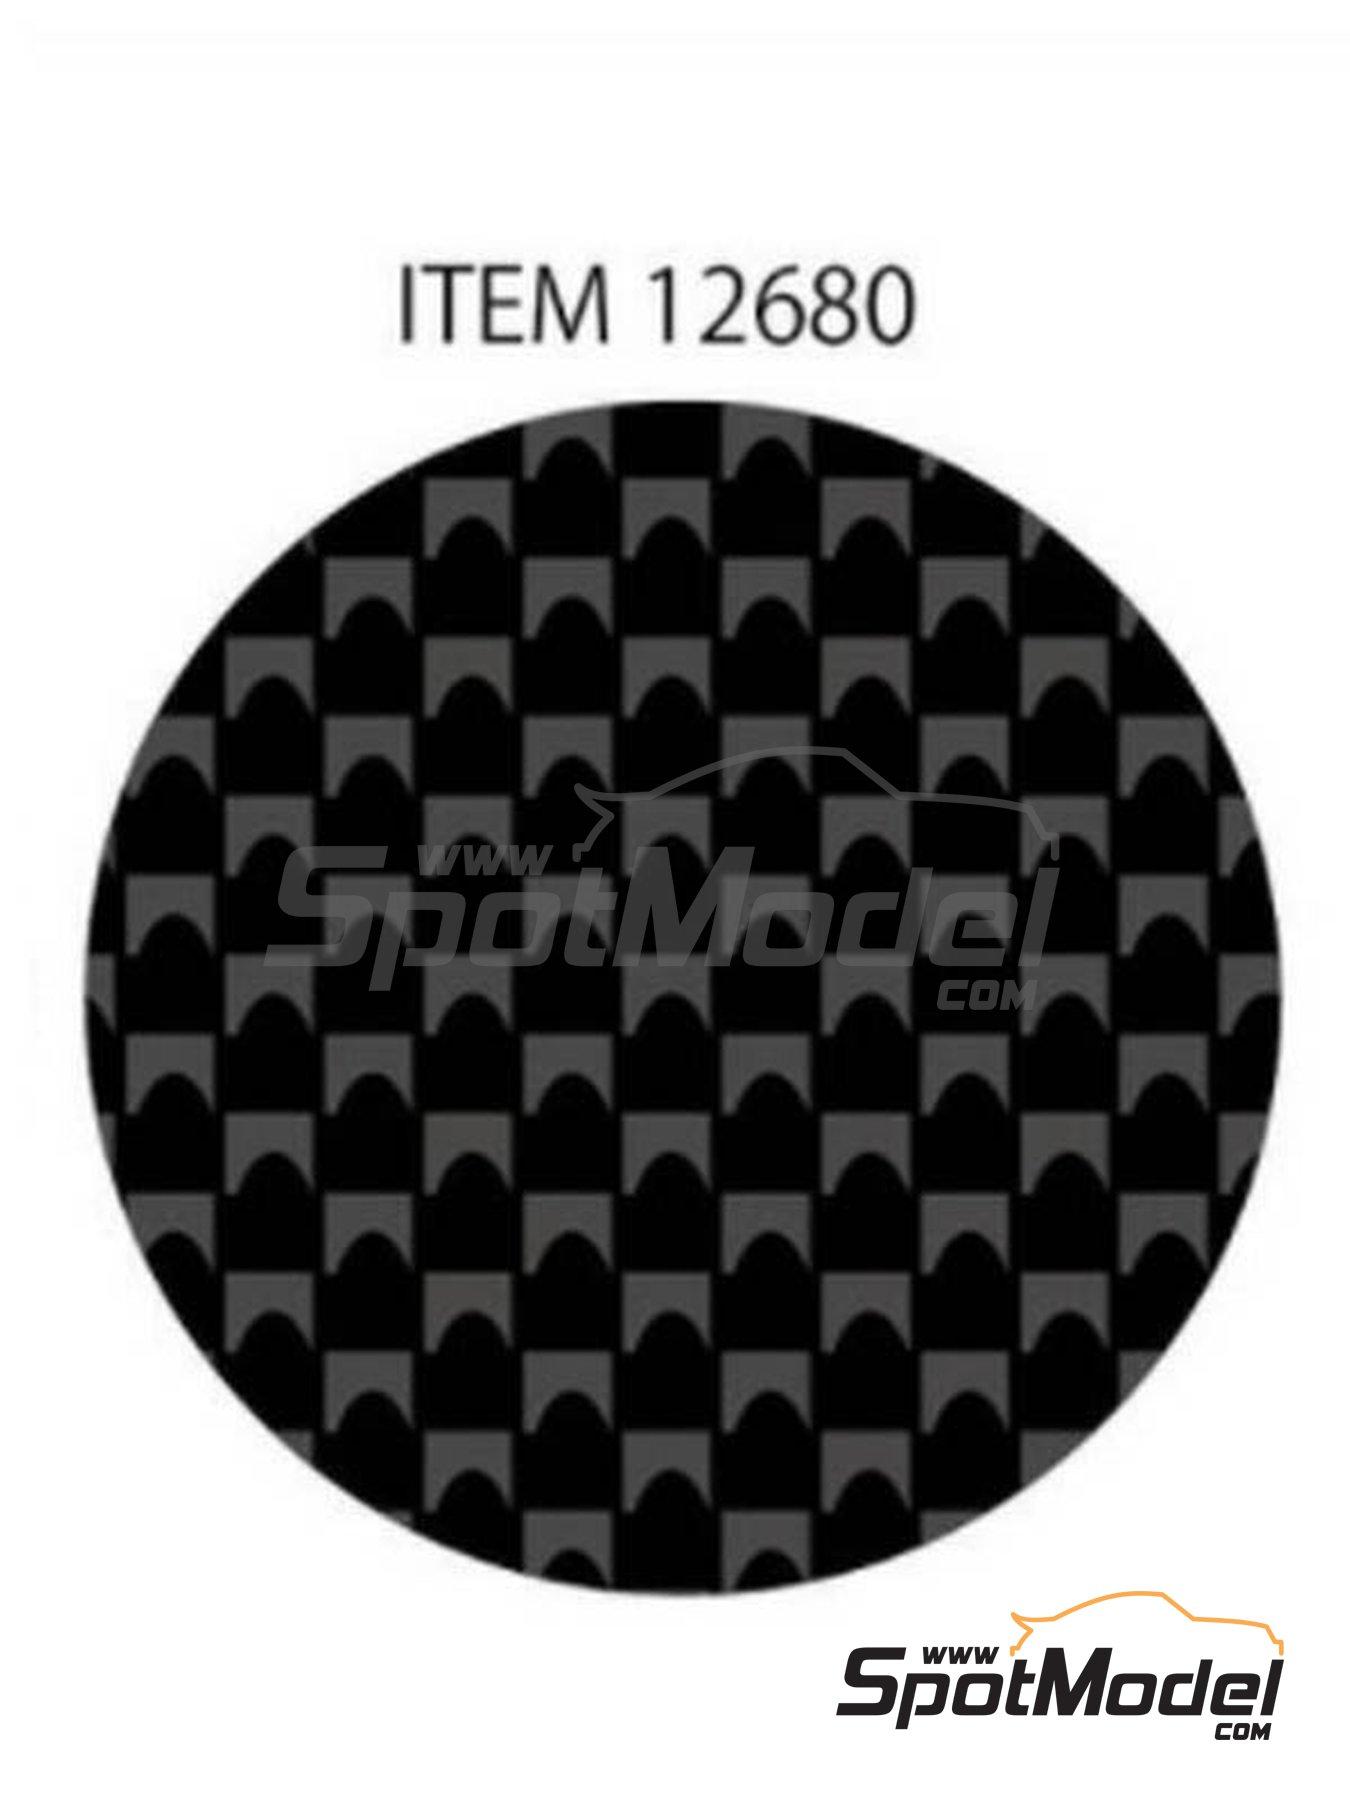 Fibra de carbono con trama rectangular muy fina | Calcas de agua fabricado por Tamiya (ref.TAM12680) image